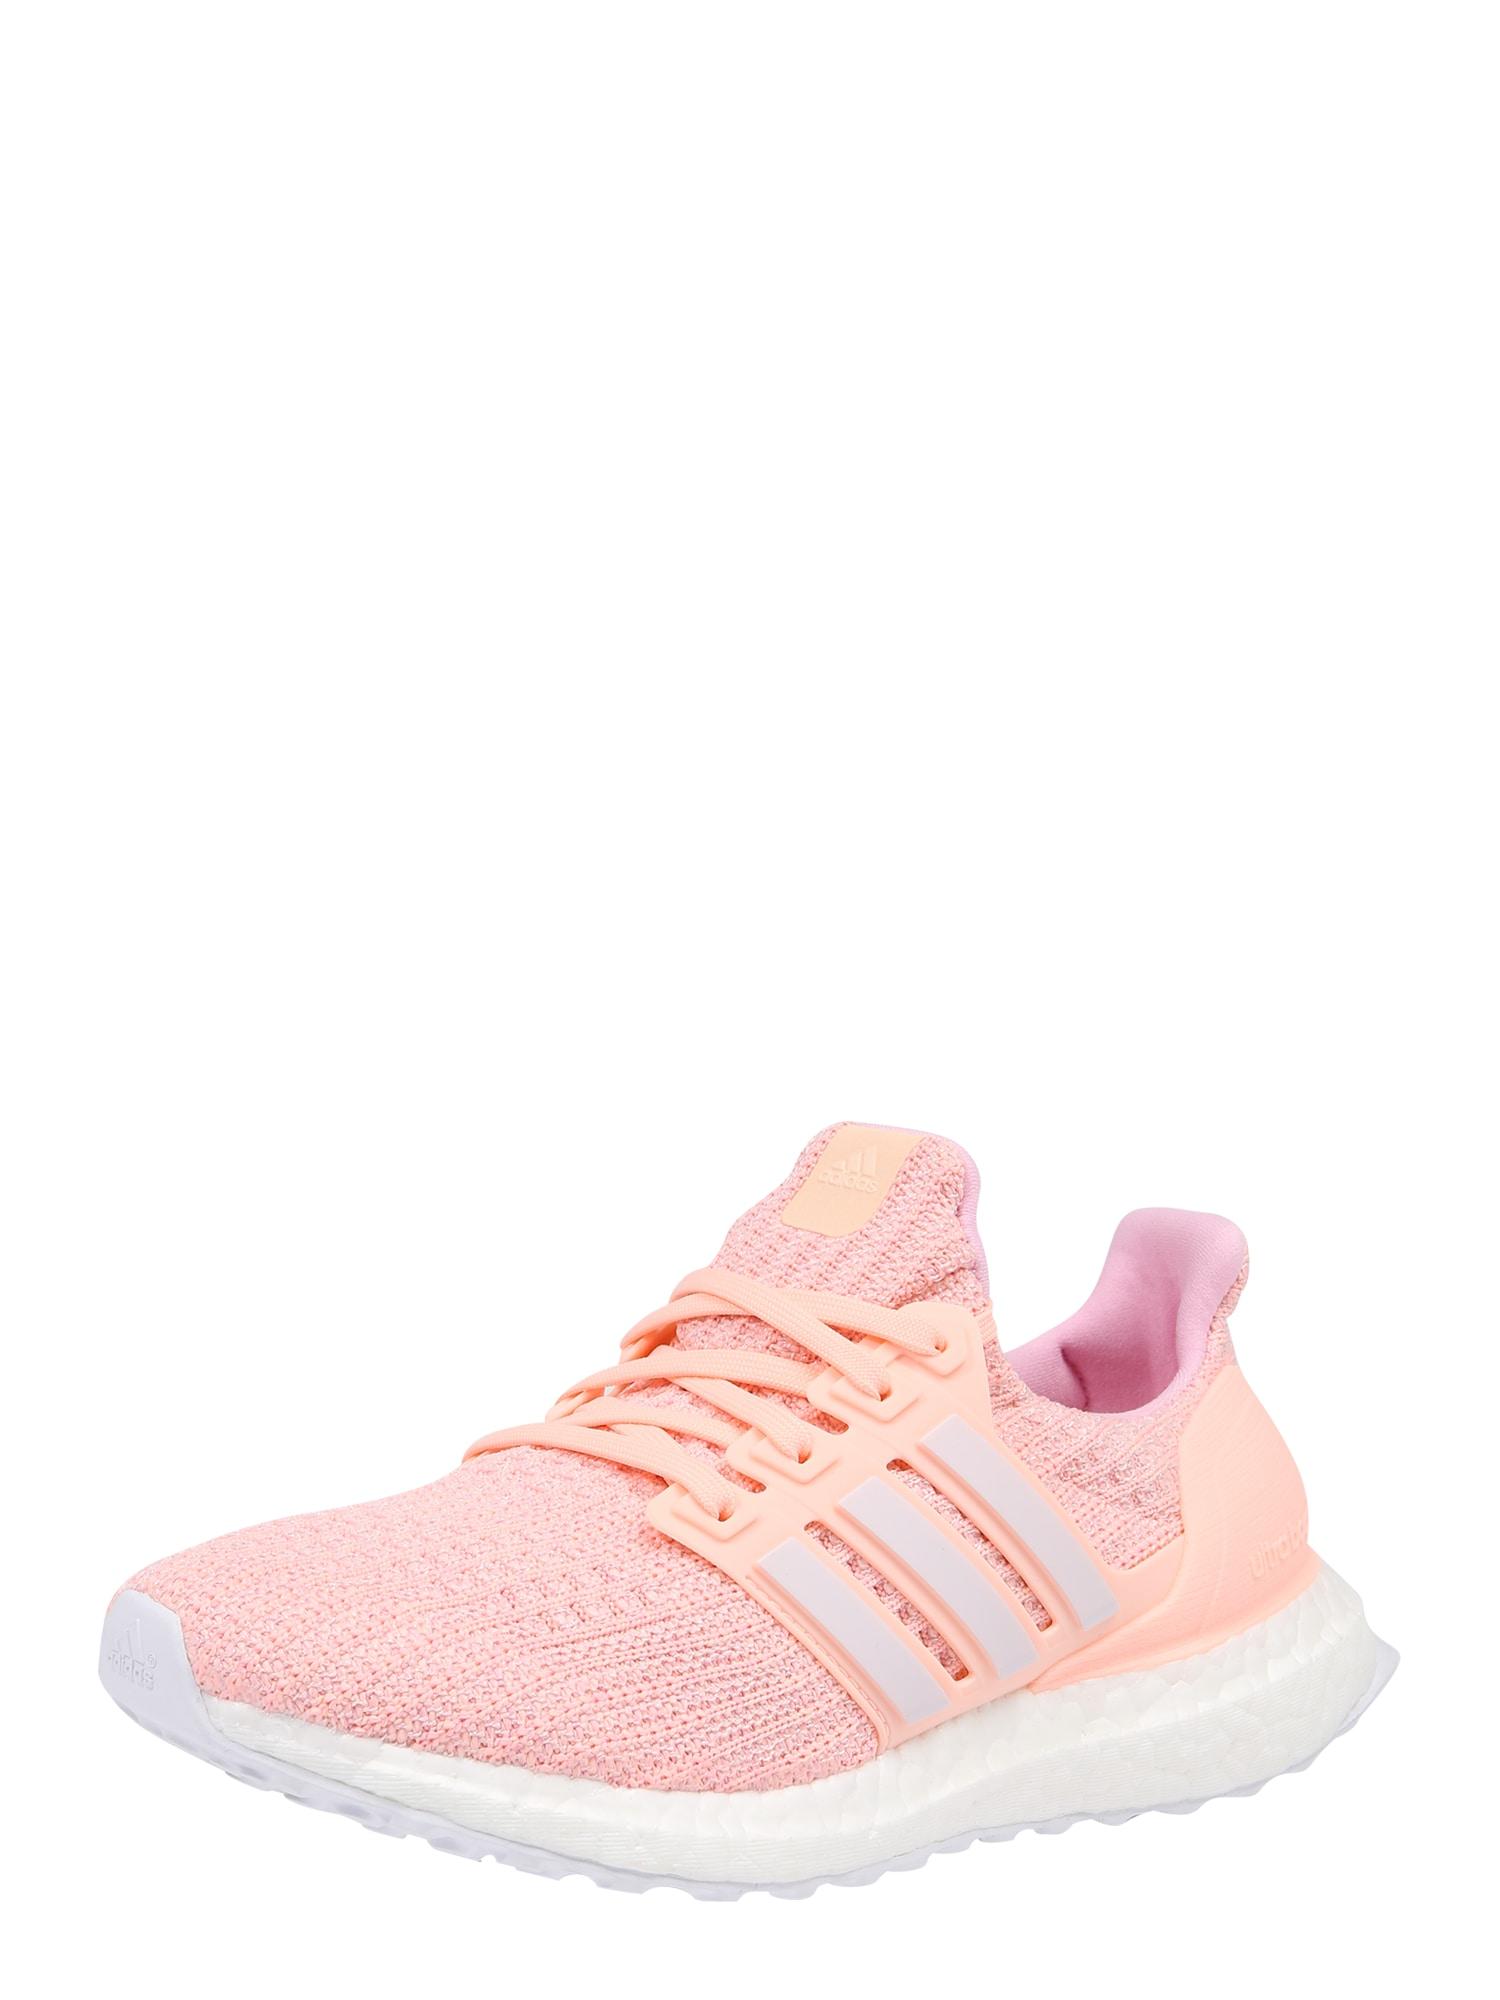 Běžecká obuv UltraBoost růžová ADIDAS PERFORMANCE